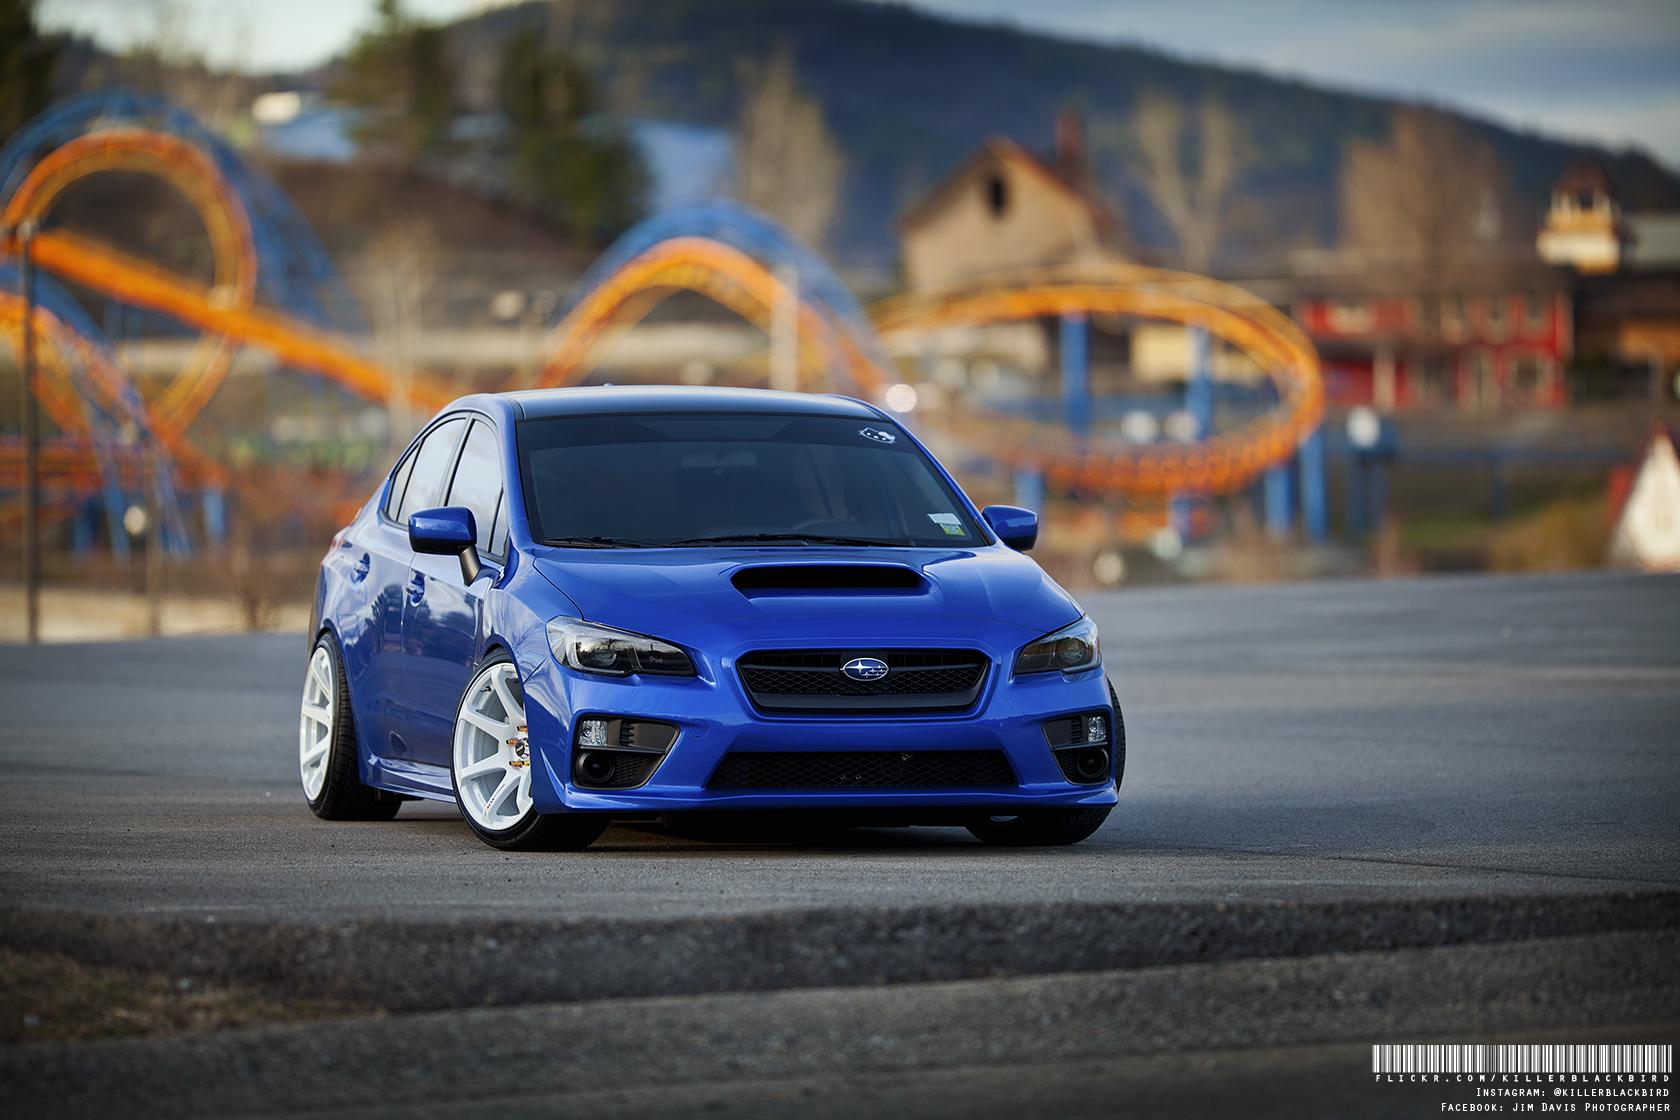 The 2015 2016 Subaru Wrx Sti Pic Thread Part 1 Page 122